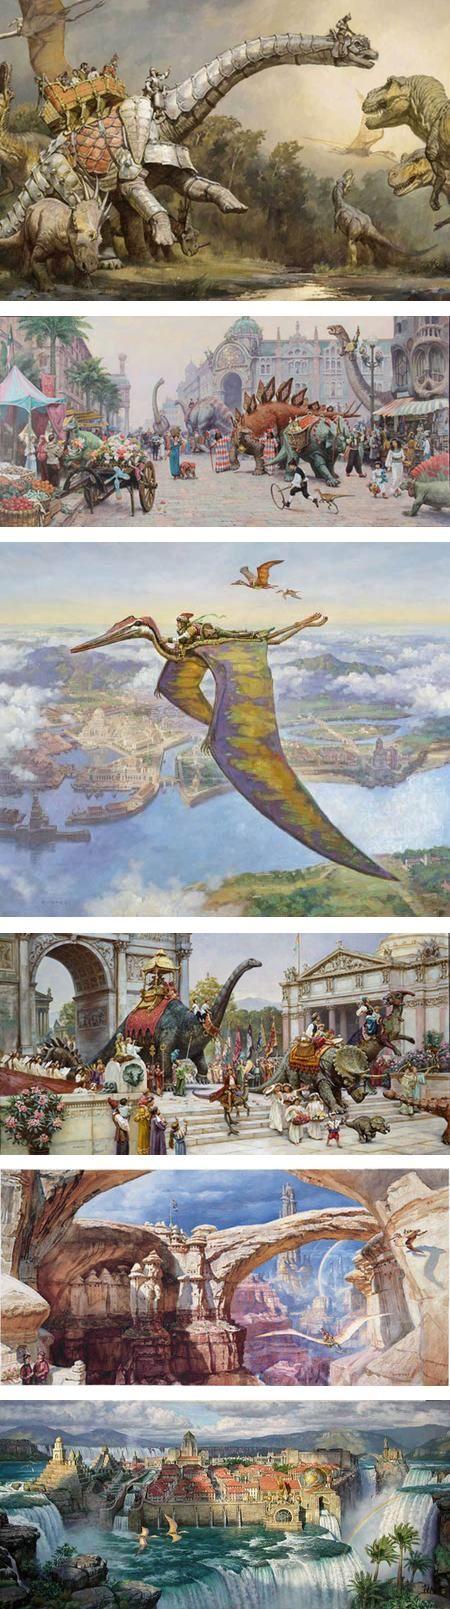 James Gurney Blog : james, gurney, Dinotopia:, Fantastical, James, Gurney, Stamford, Museum, Lines, Colors, About, Drawing,, Painting,, Illustrati…, Dinosaur, Concept